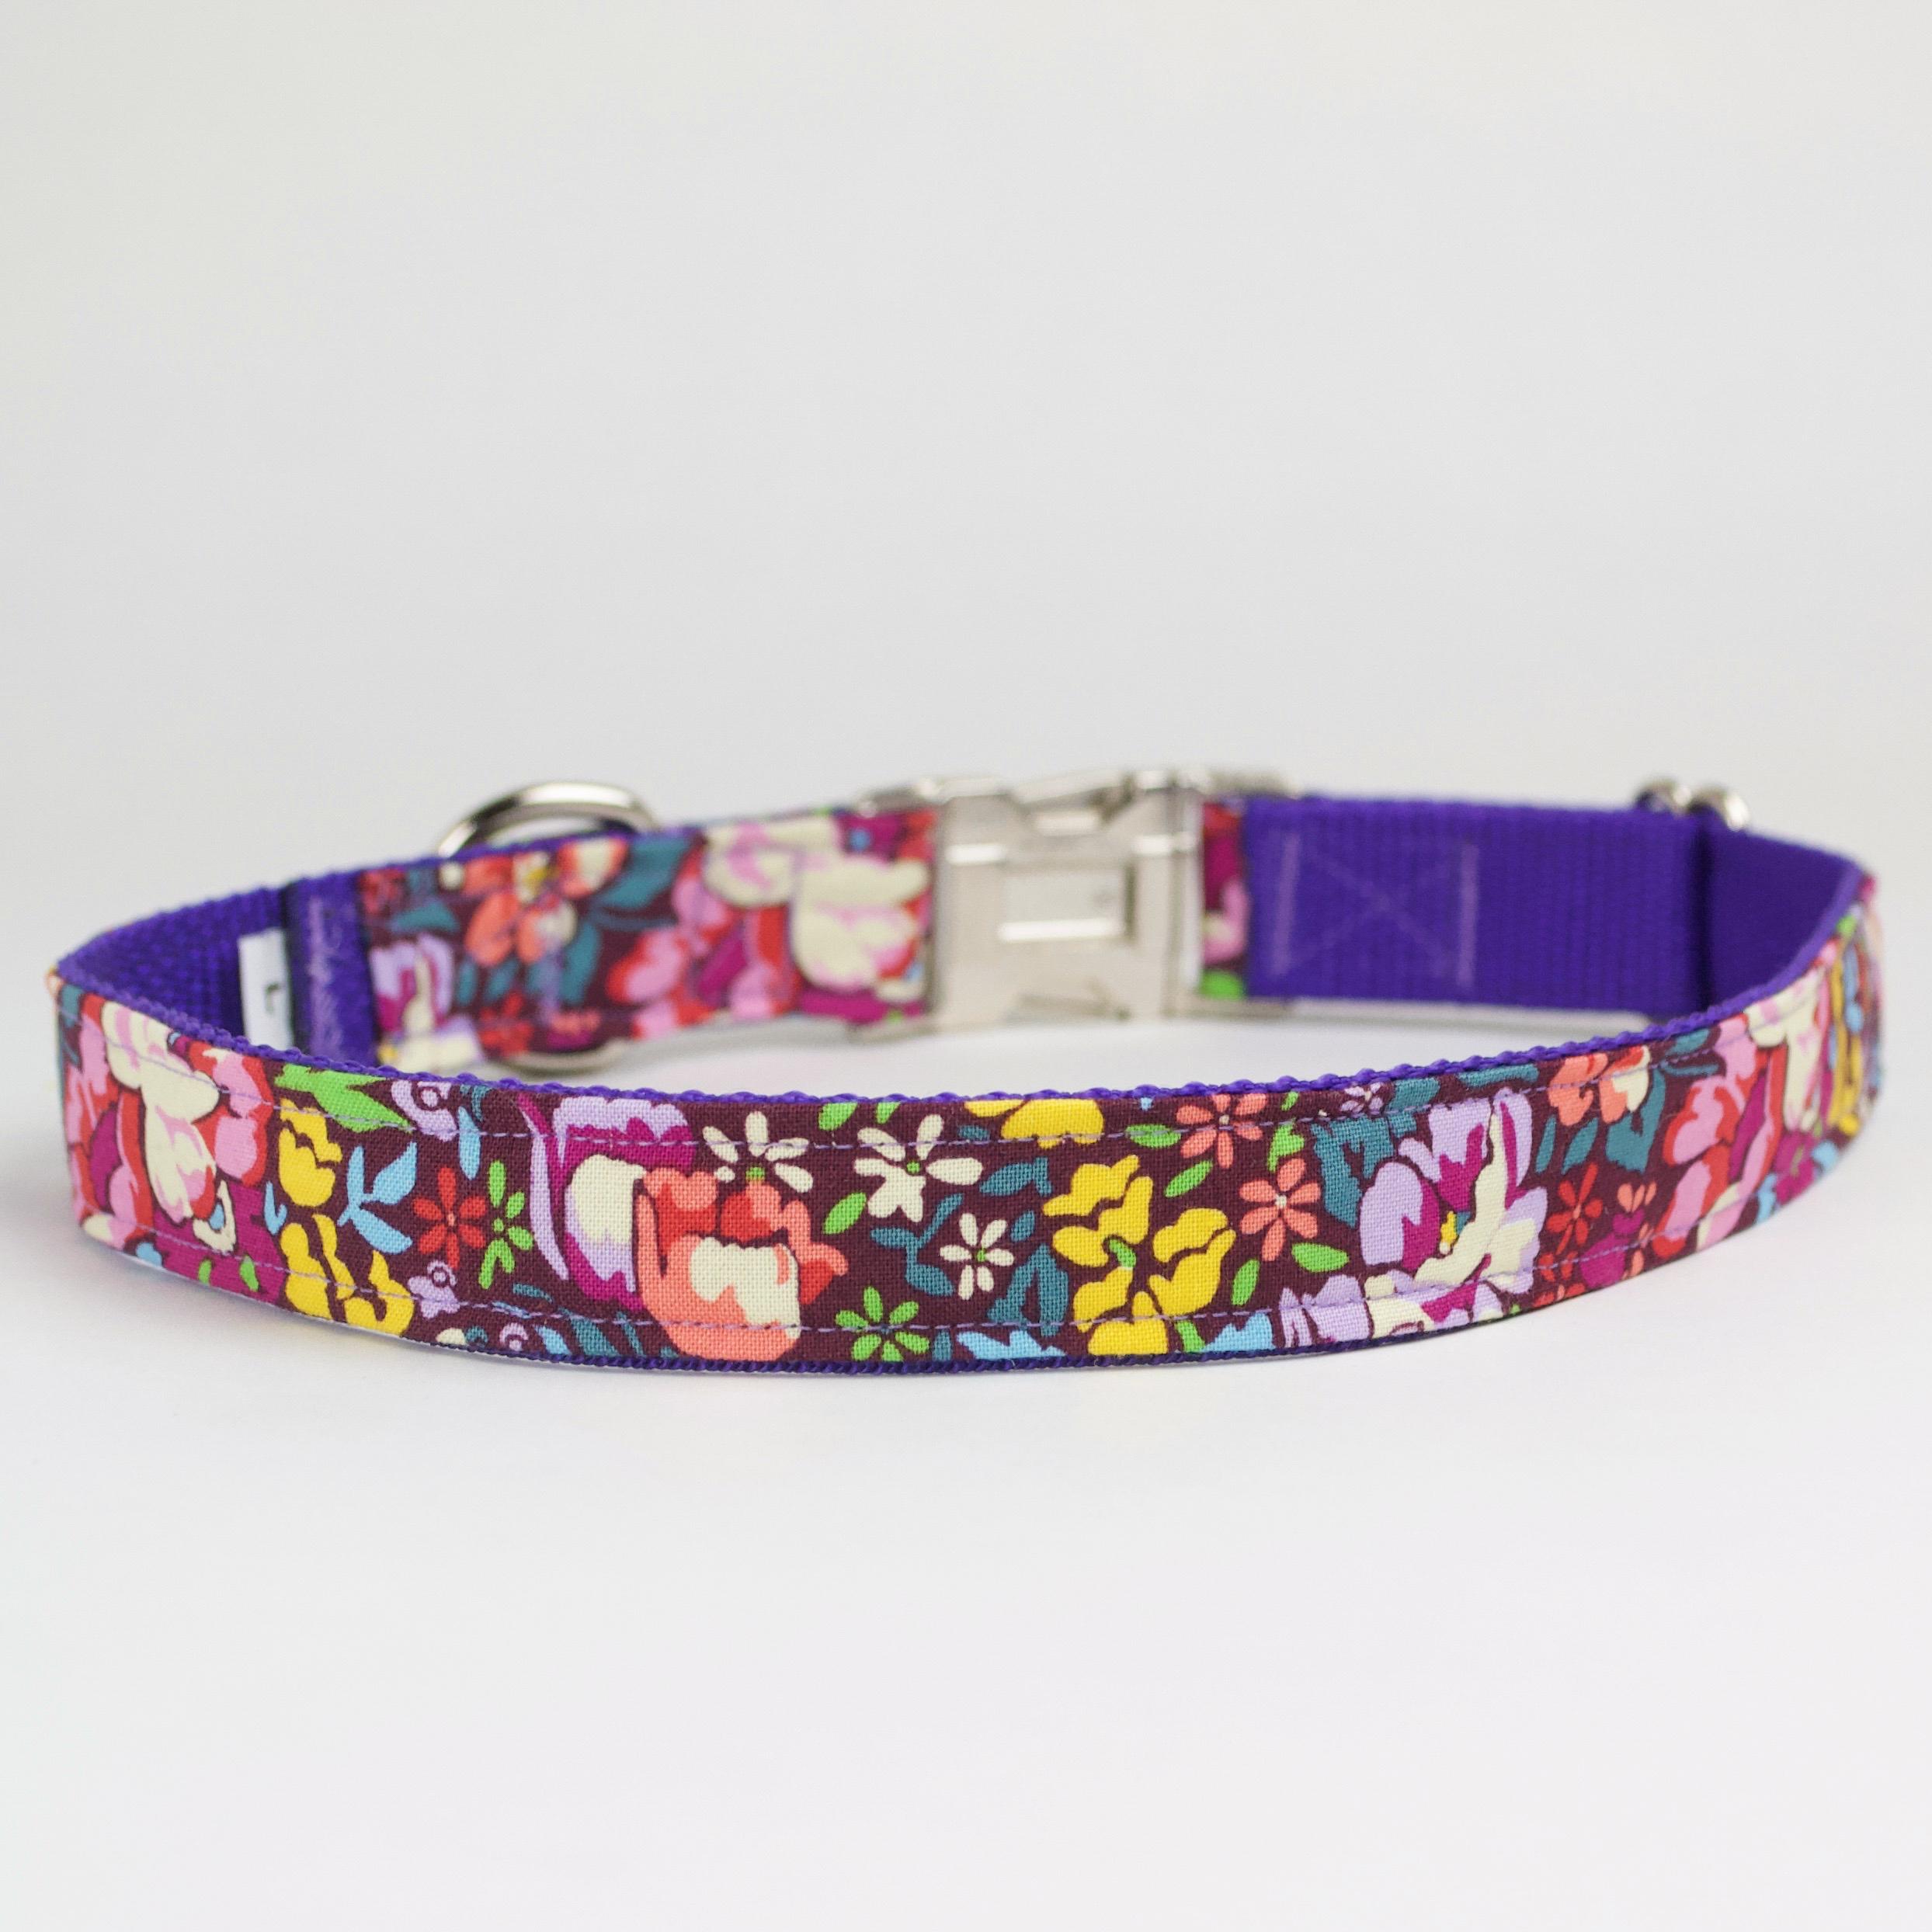 Celebrate an Adoptaversary with a Twilight Garden Floral